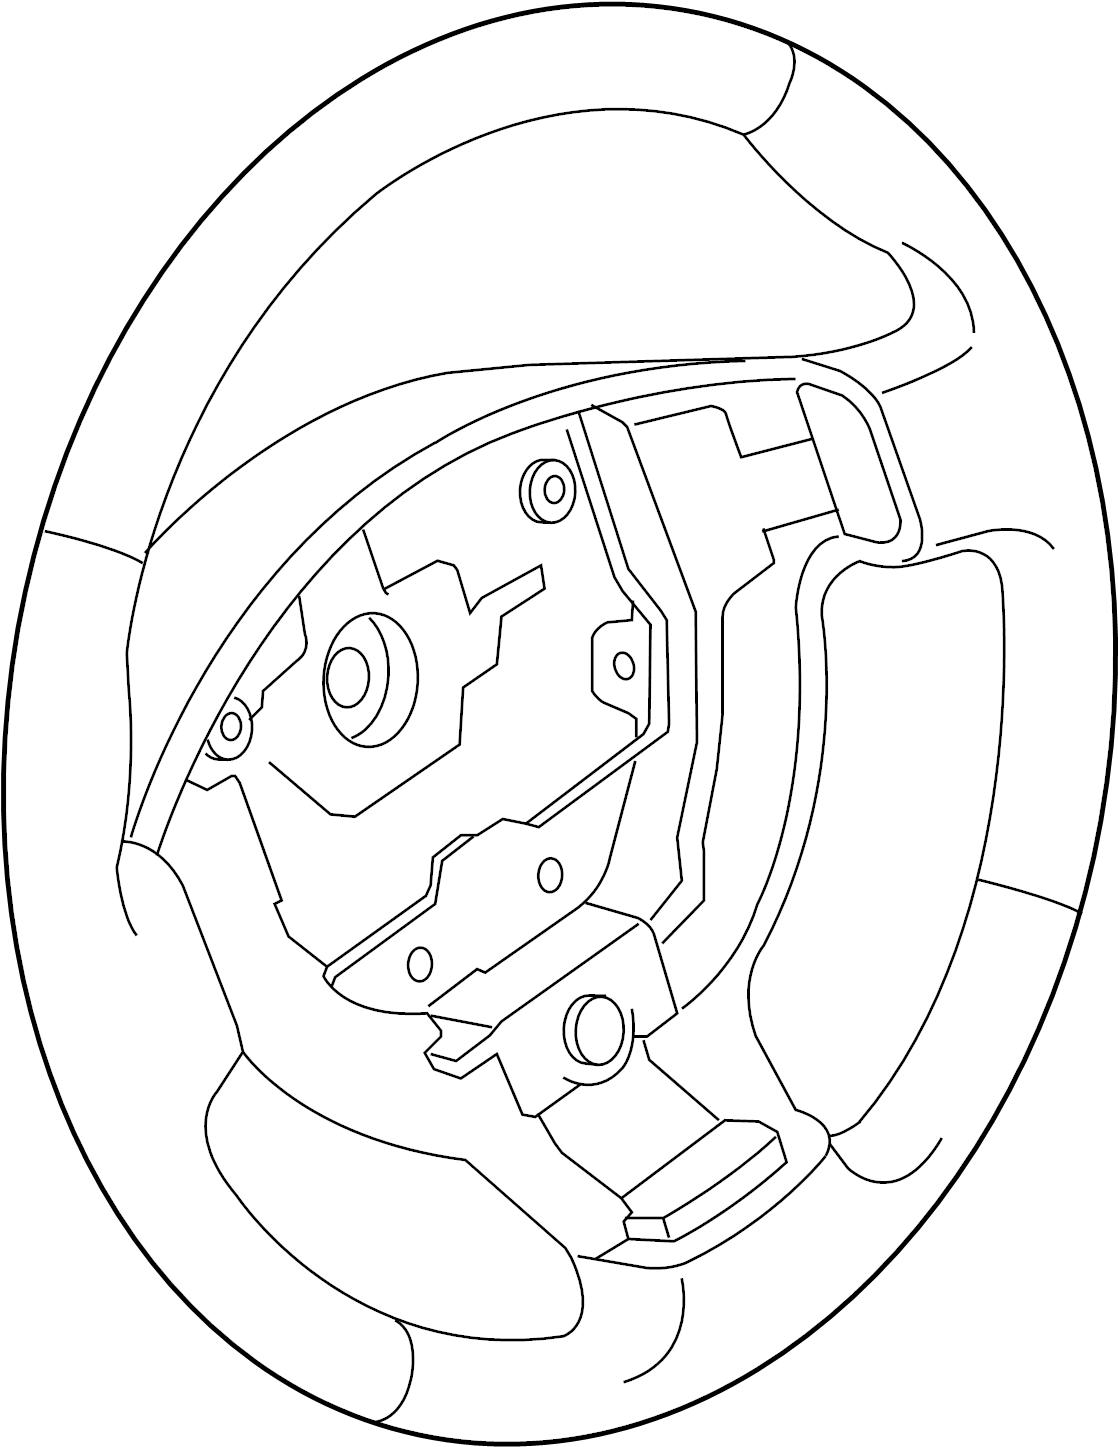 Nissan Sentra Steering Wheel. Sentra; 2.0L; w/o Leather